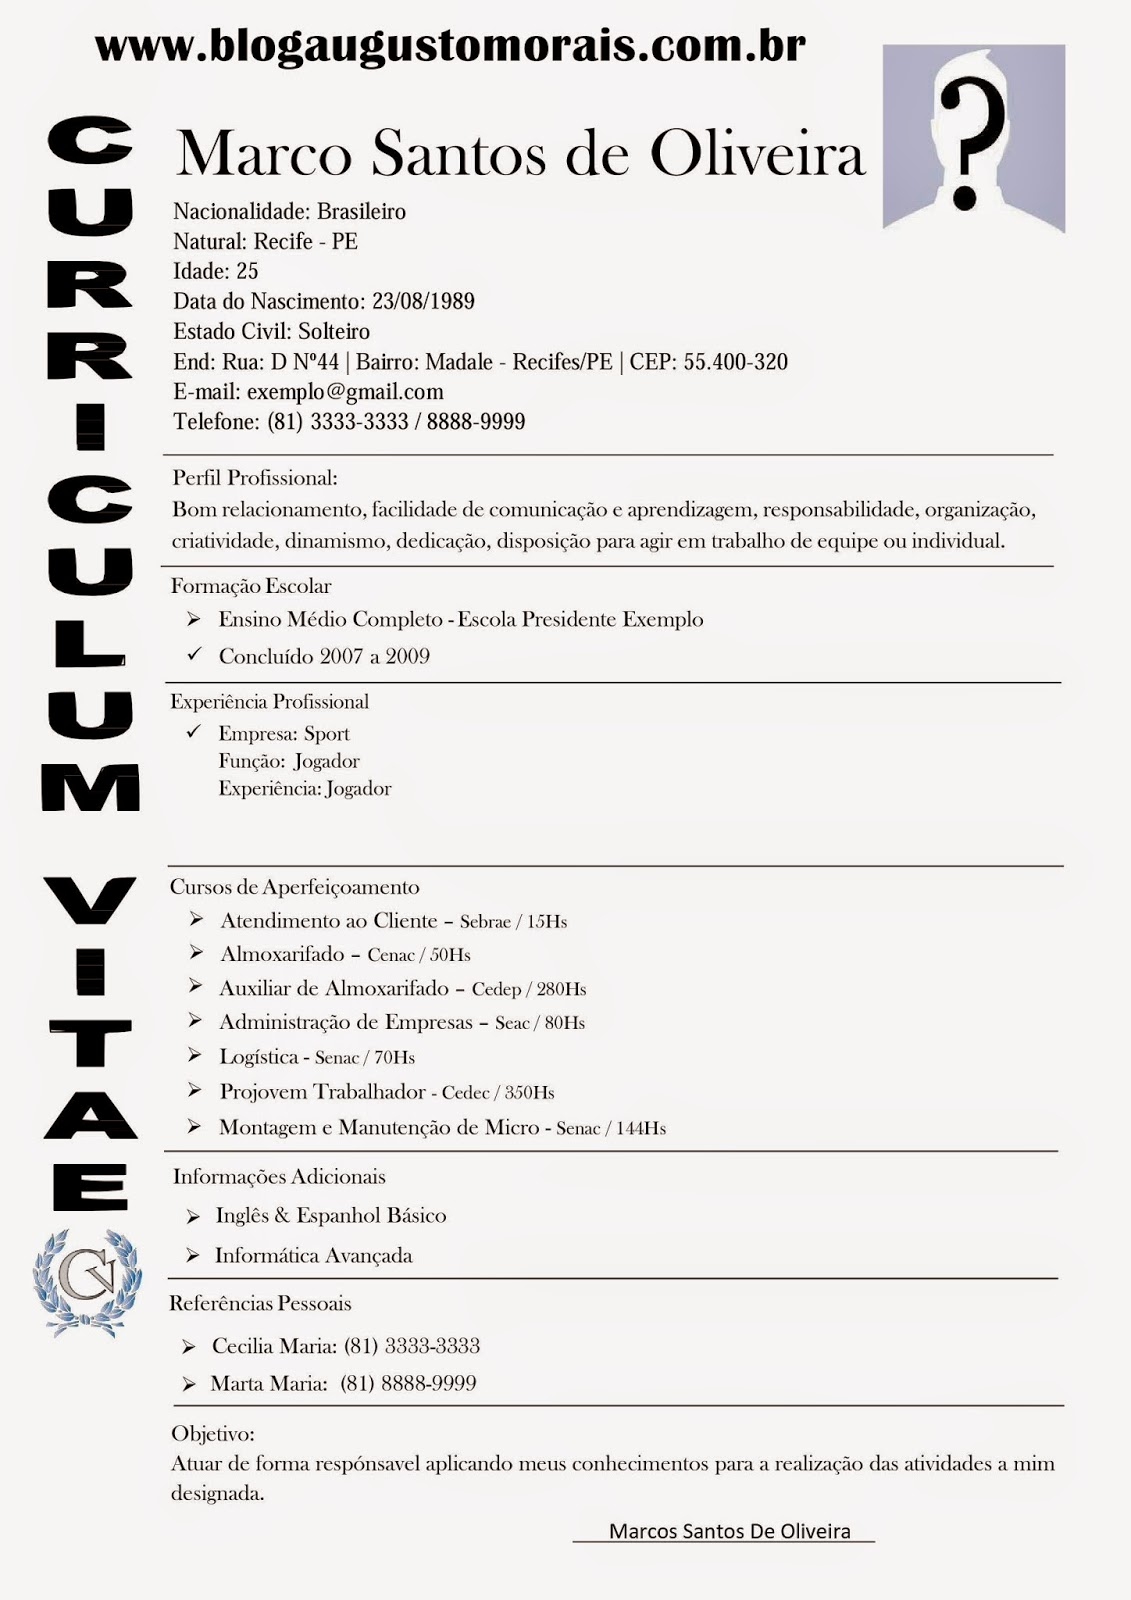 Modelos De Curriculo Profissional Gratis Blog Augusto Morais De